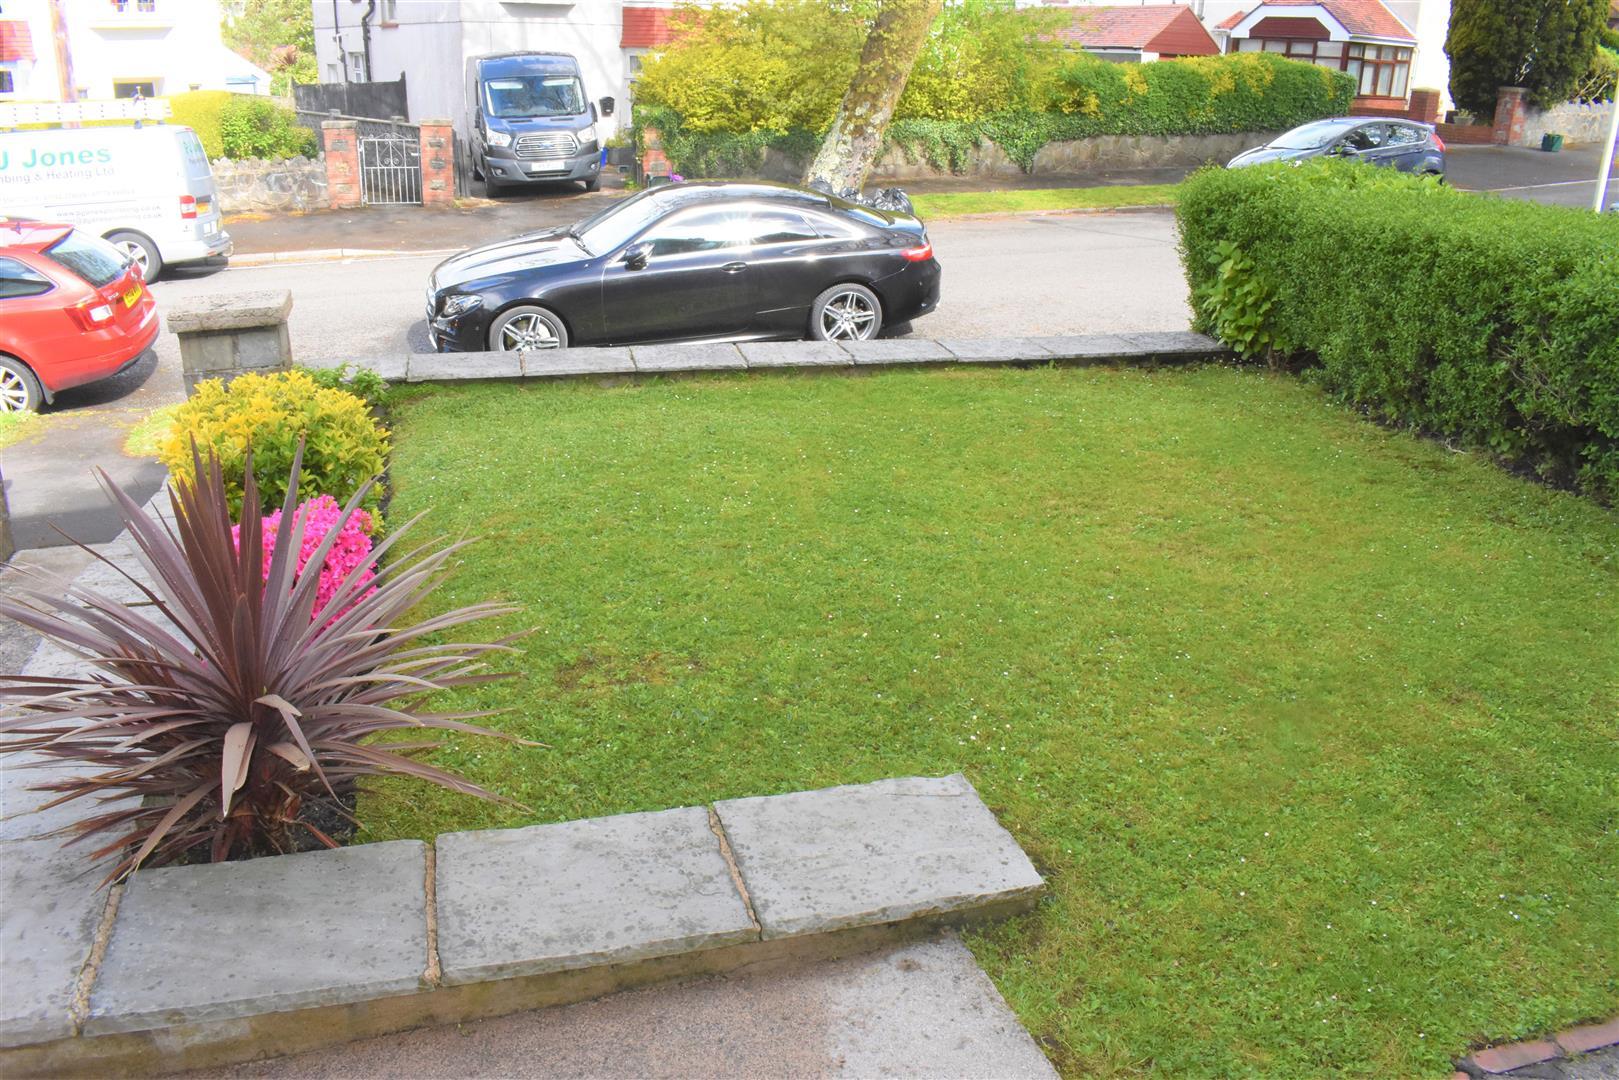 Glanmor Park Road, Sketty, Swansea, SA2 0QE